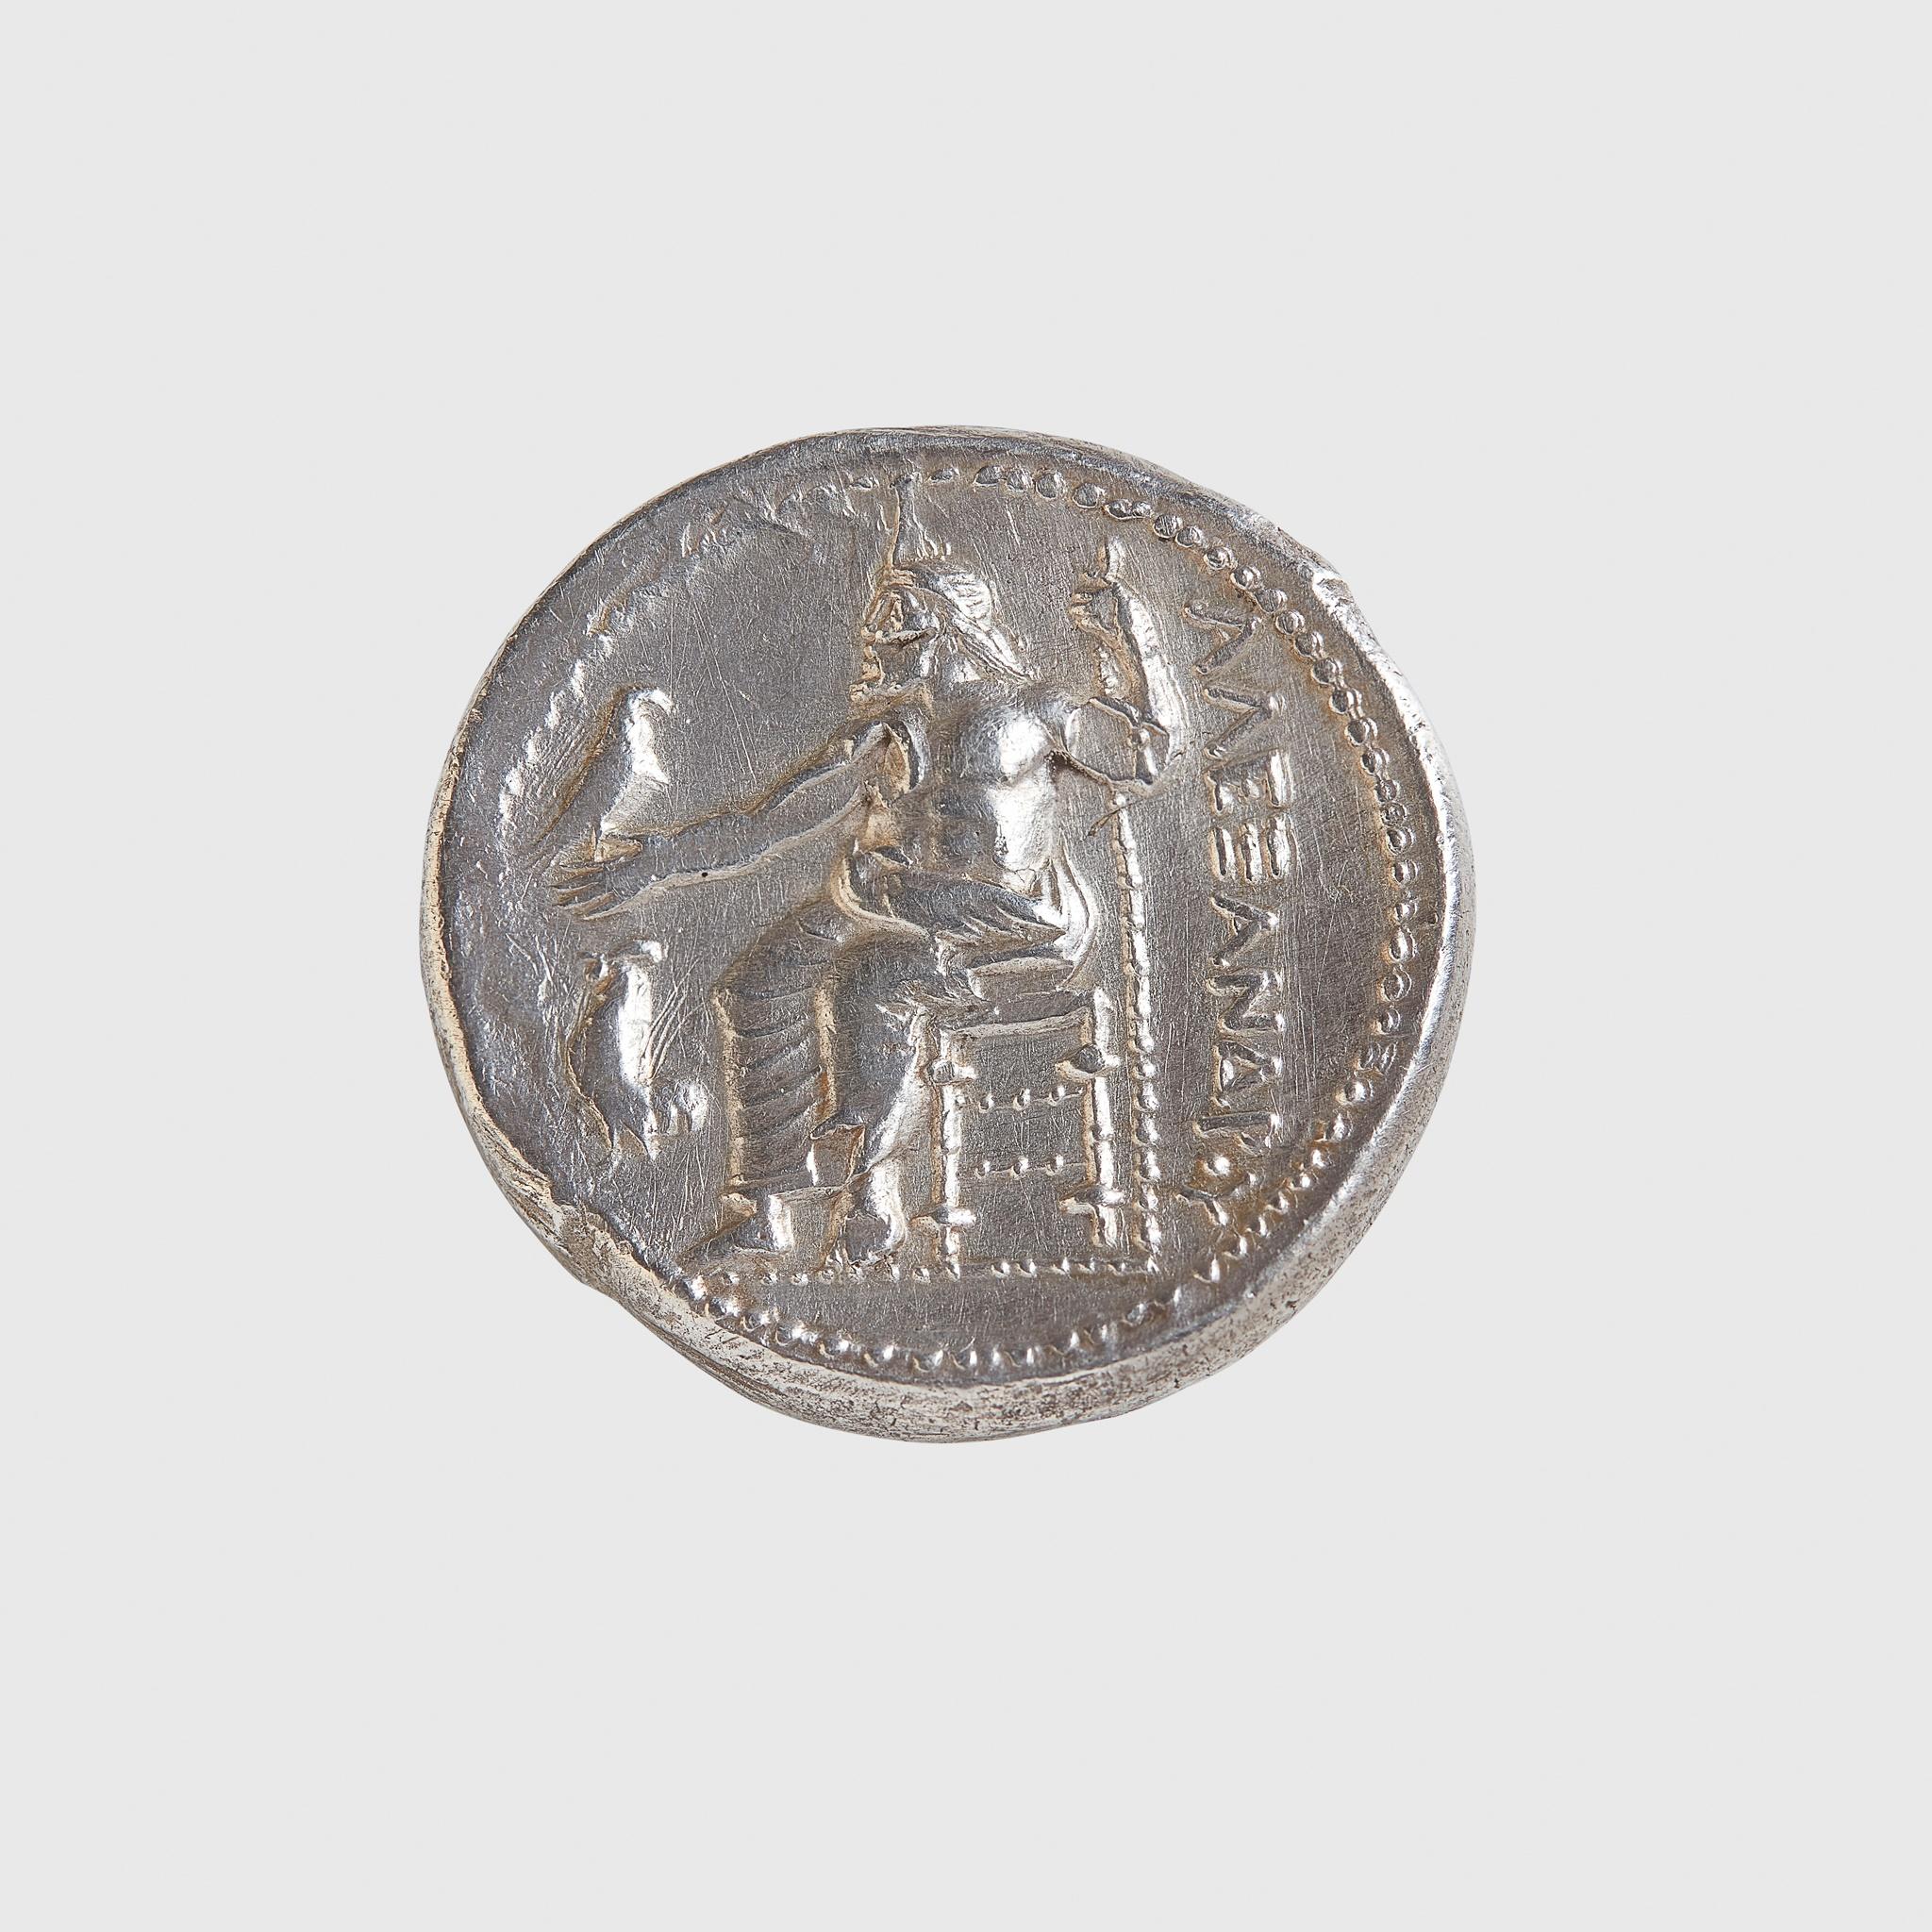 ALEXANDER THE GREAT SILVER TETRADRACHM GREECE, AMPHIPOLIS MINT, 325 - 323 B.C. - Image 2 of 2